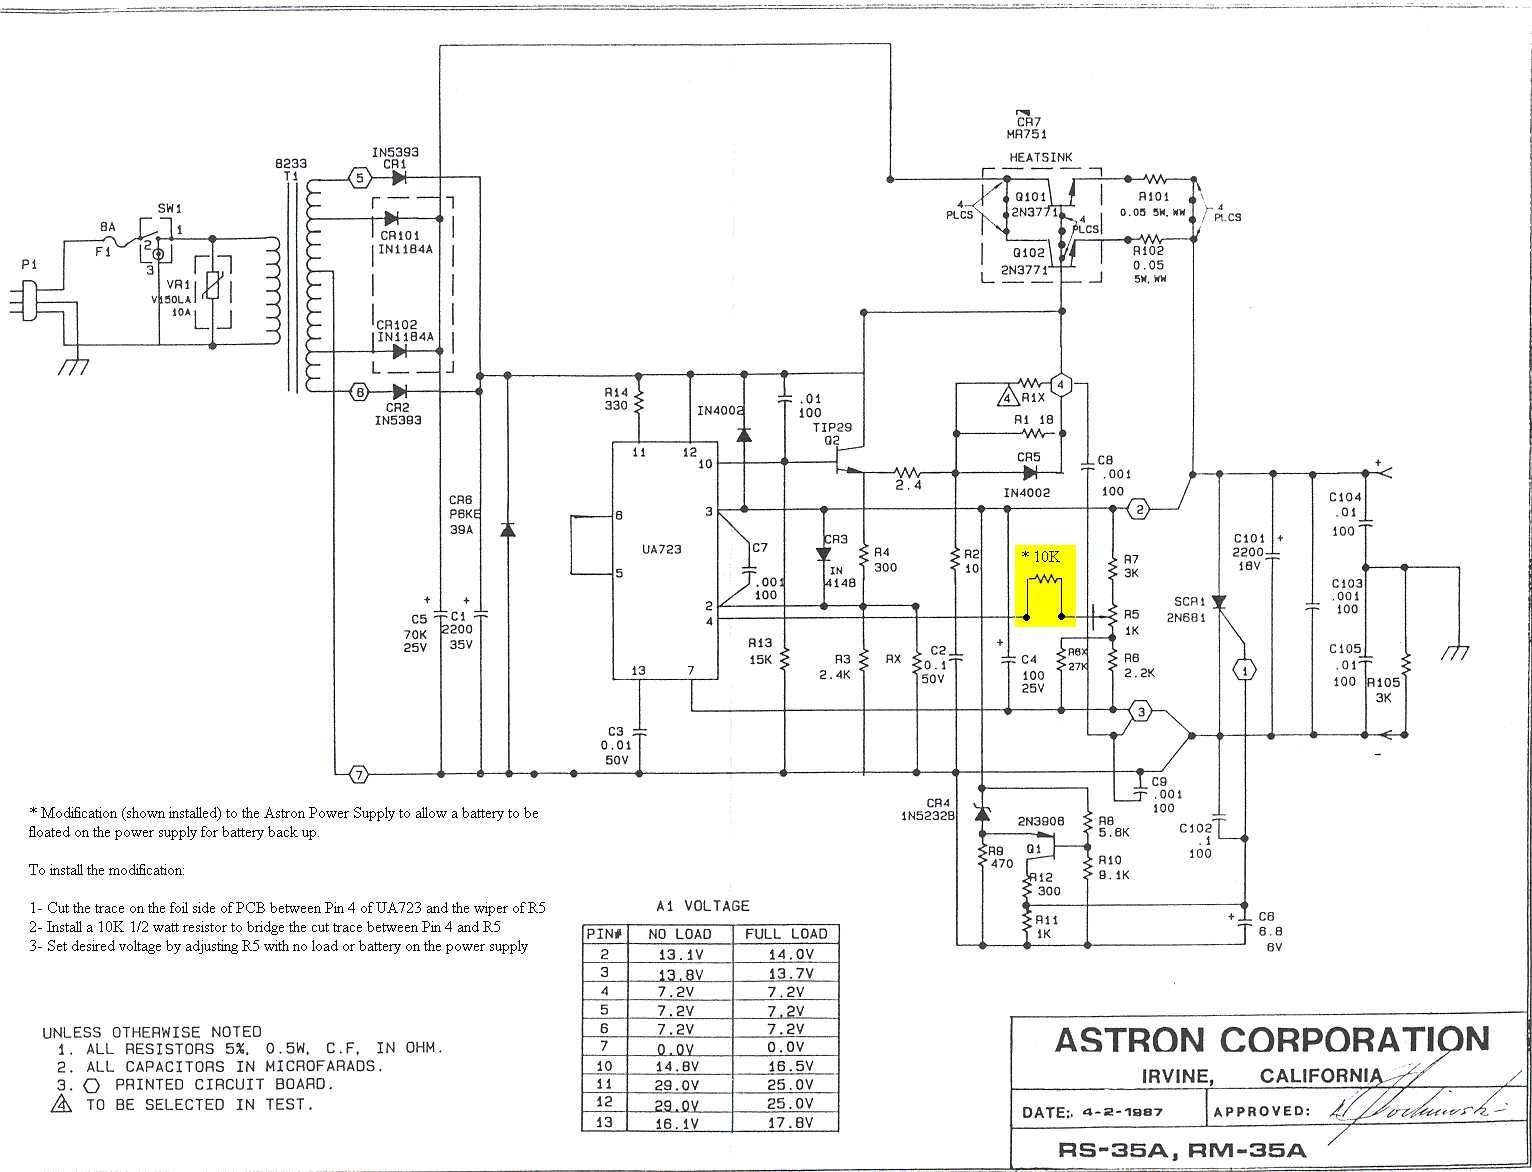 solucionado  problema fuente de poder de 13 8 volt modelo rs-35a - radiocomunicaciones